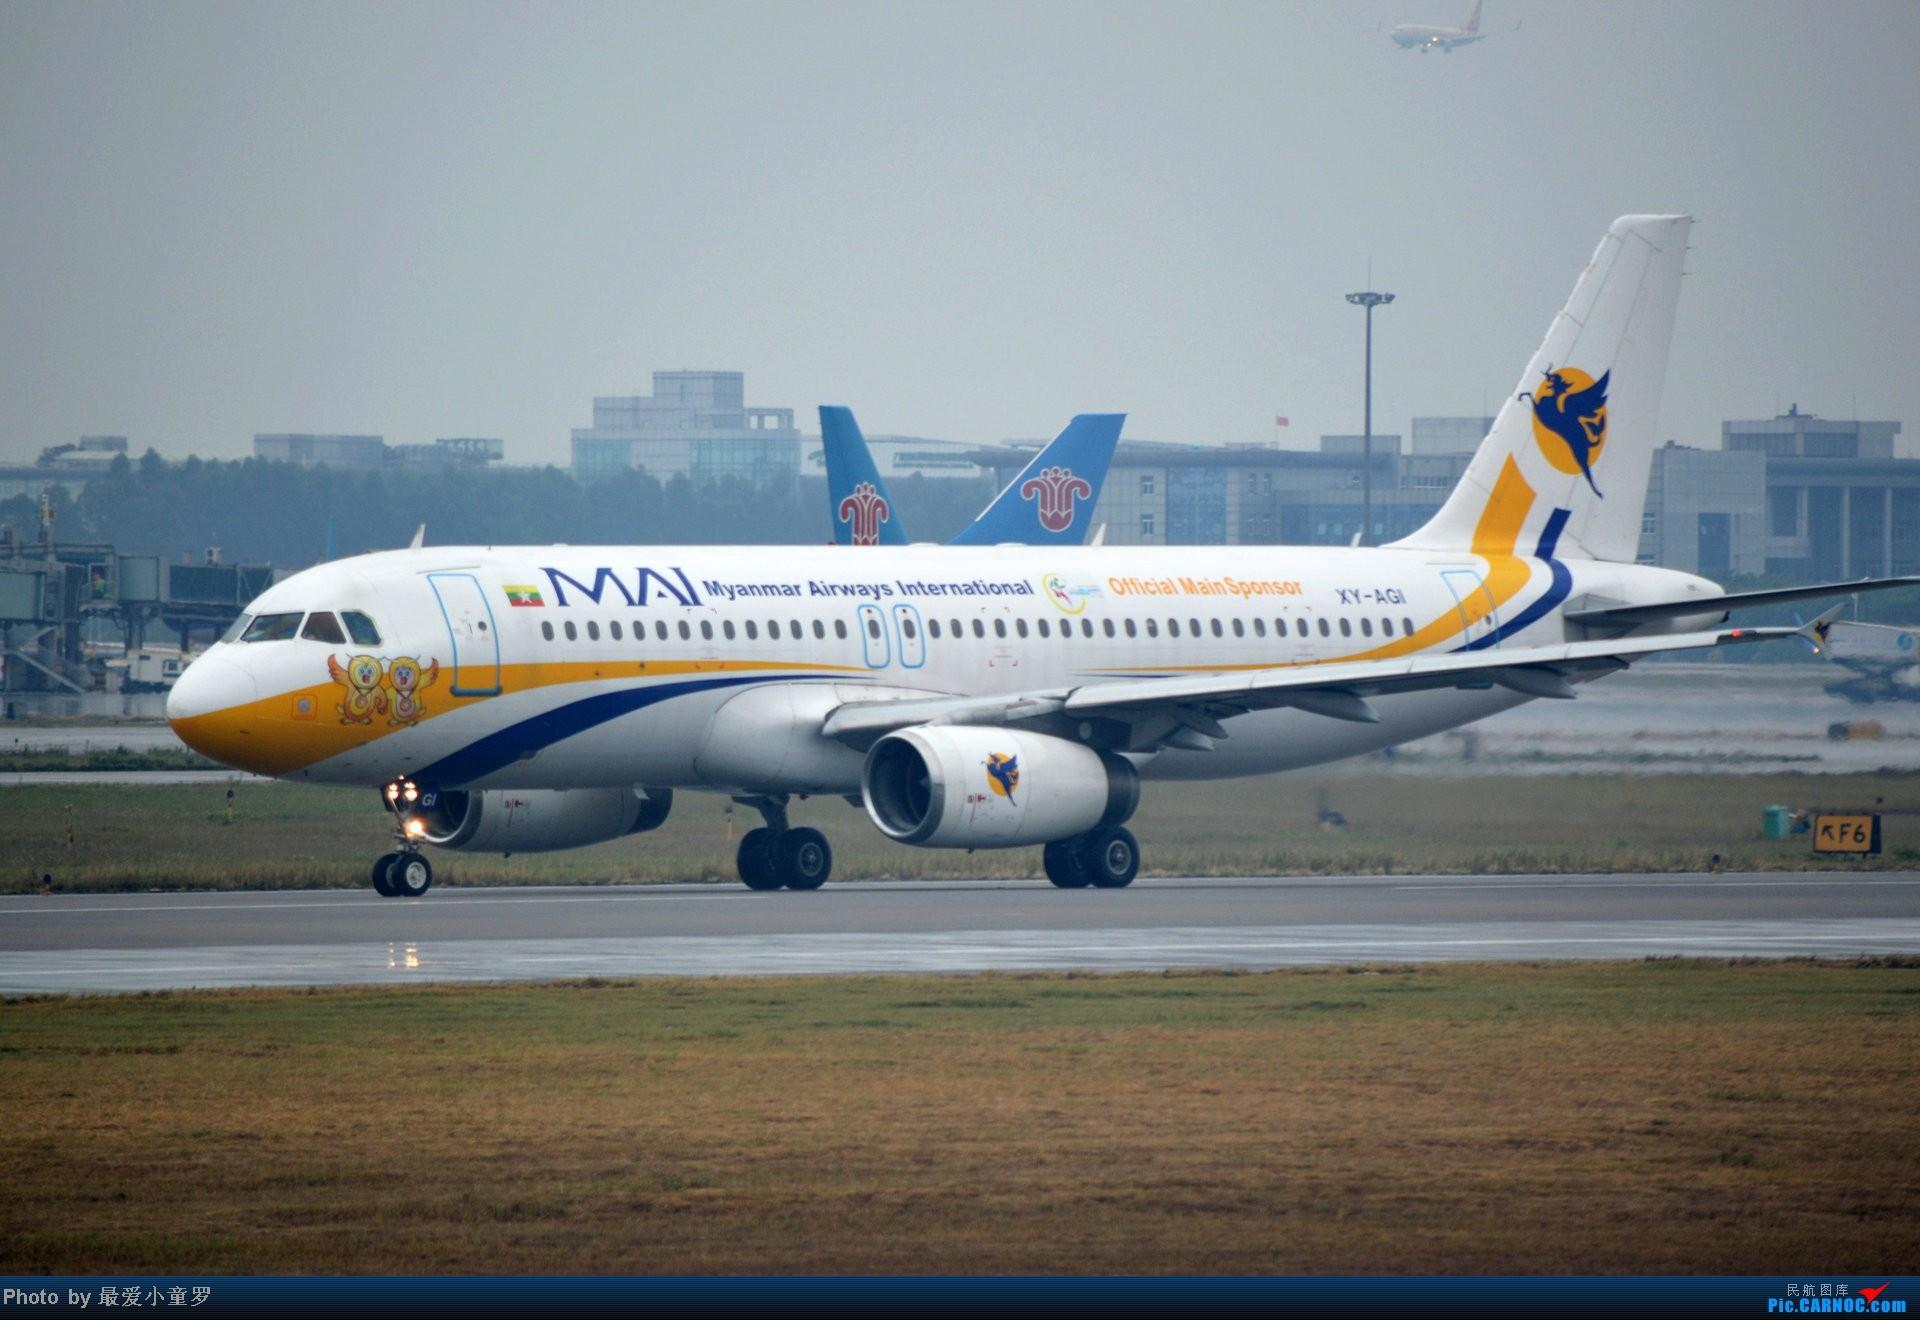 Re:[原创]去年在CAN拍国航757退役时候的那个冷雨周末 AIRBUS A320-200 XY-AGI 中国广州白云机场